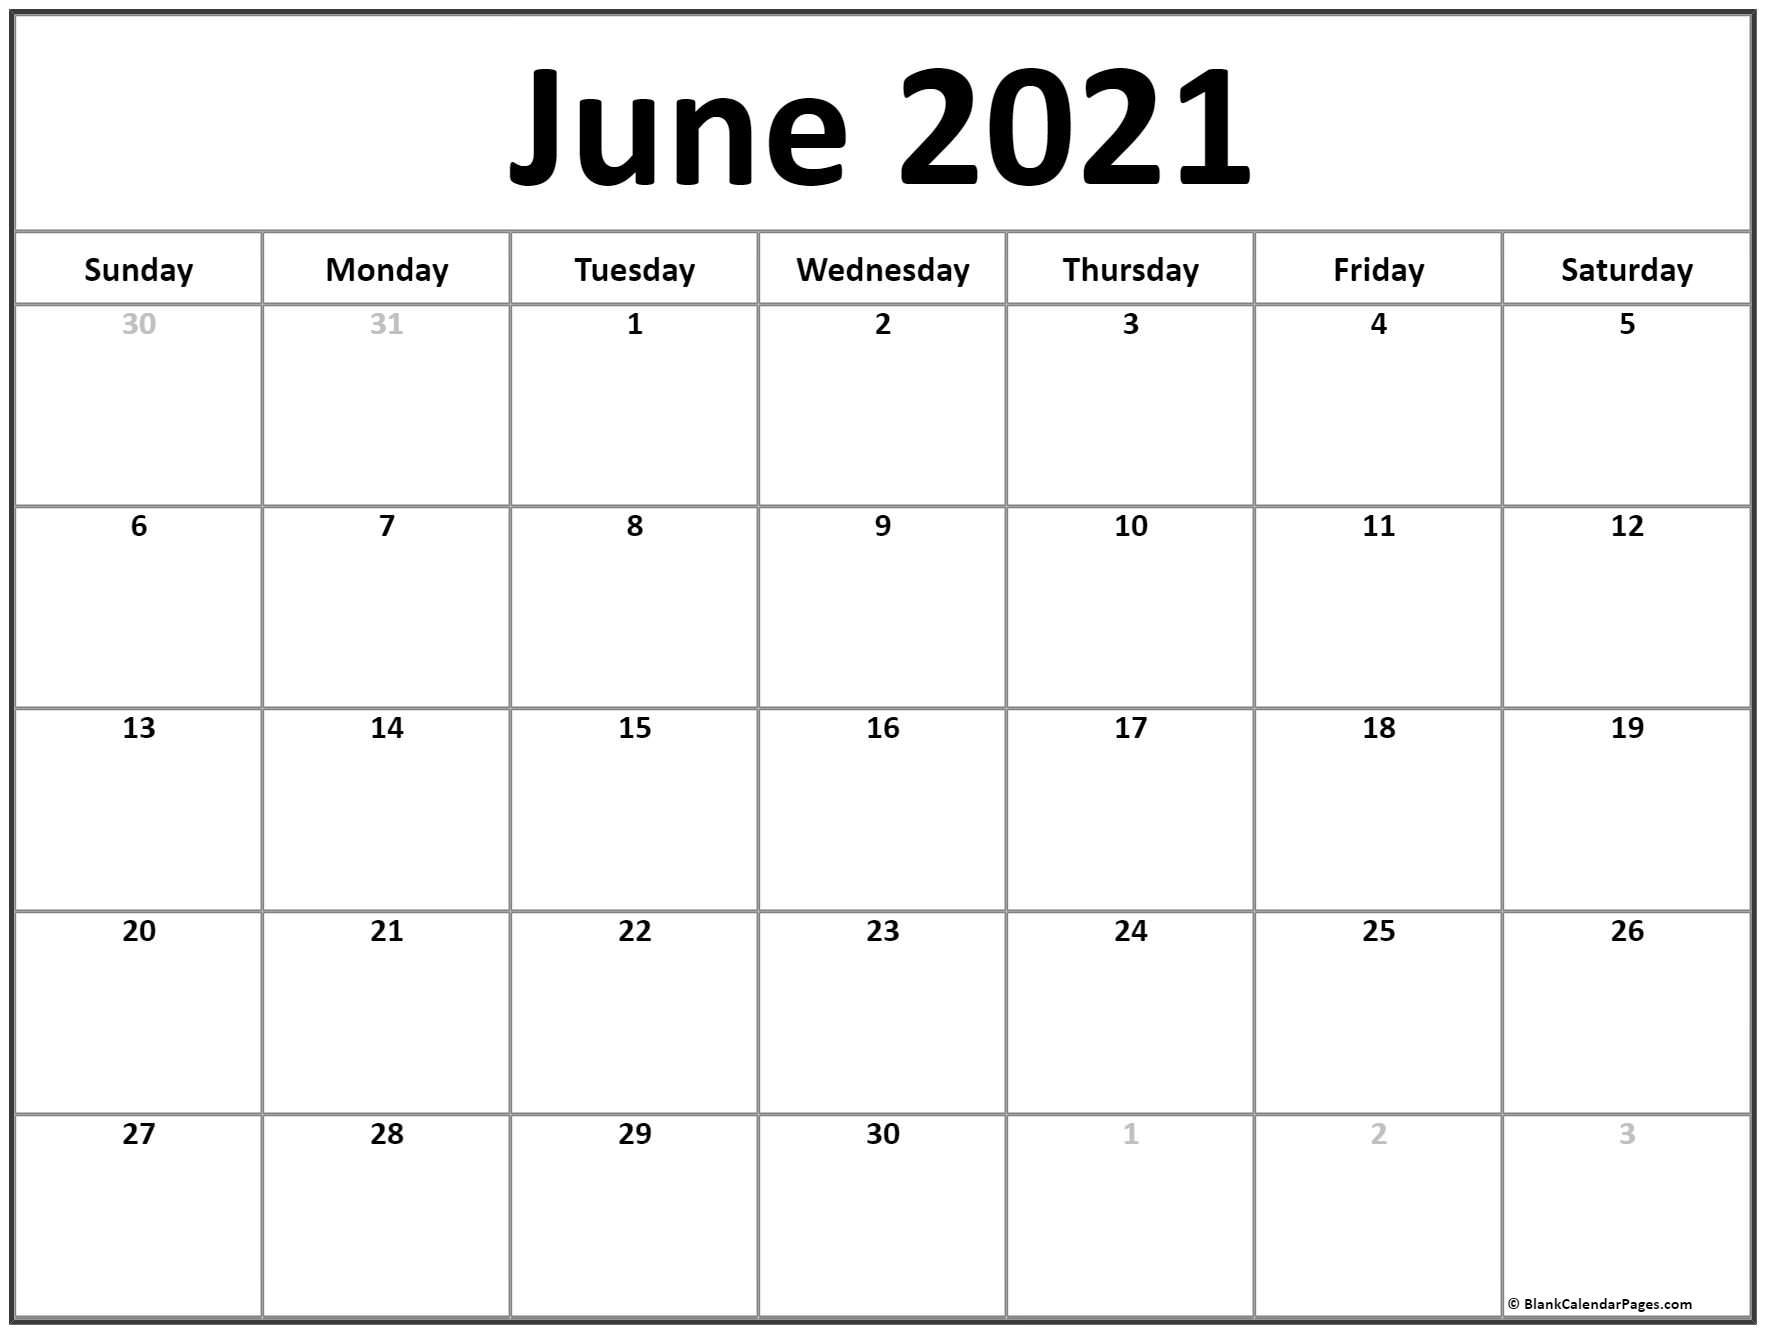 June 2021 Calendar | Free Printable Monthly Calendars